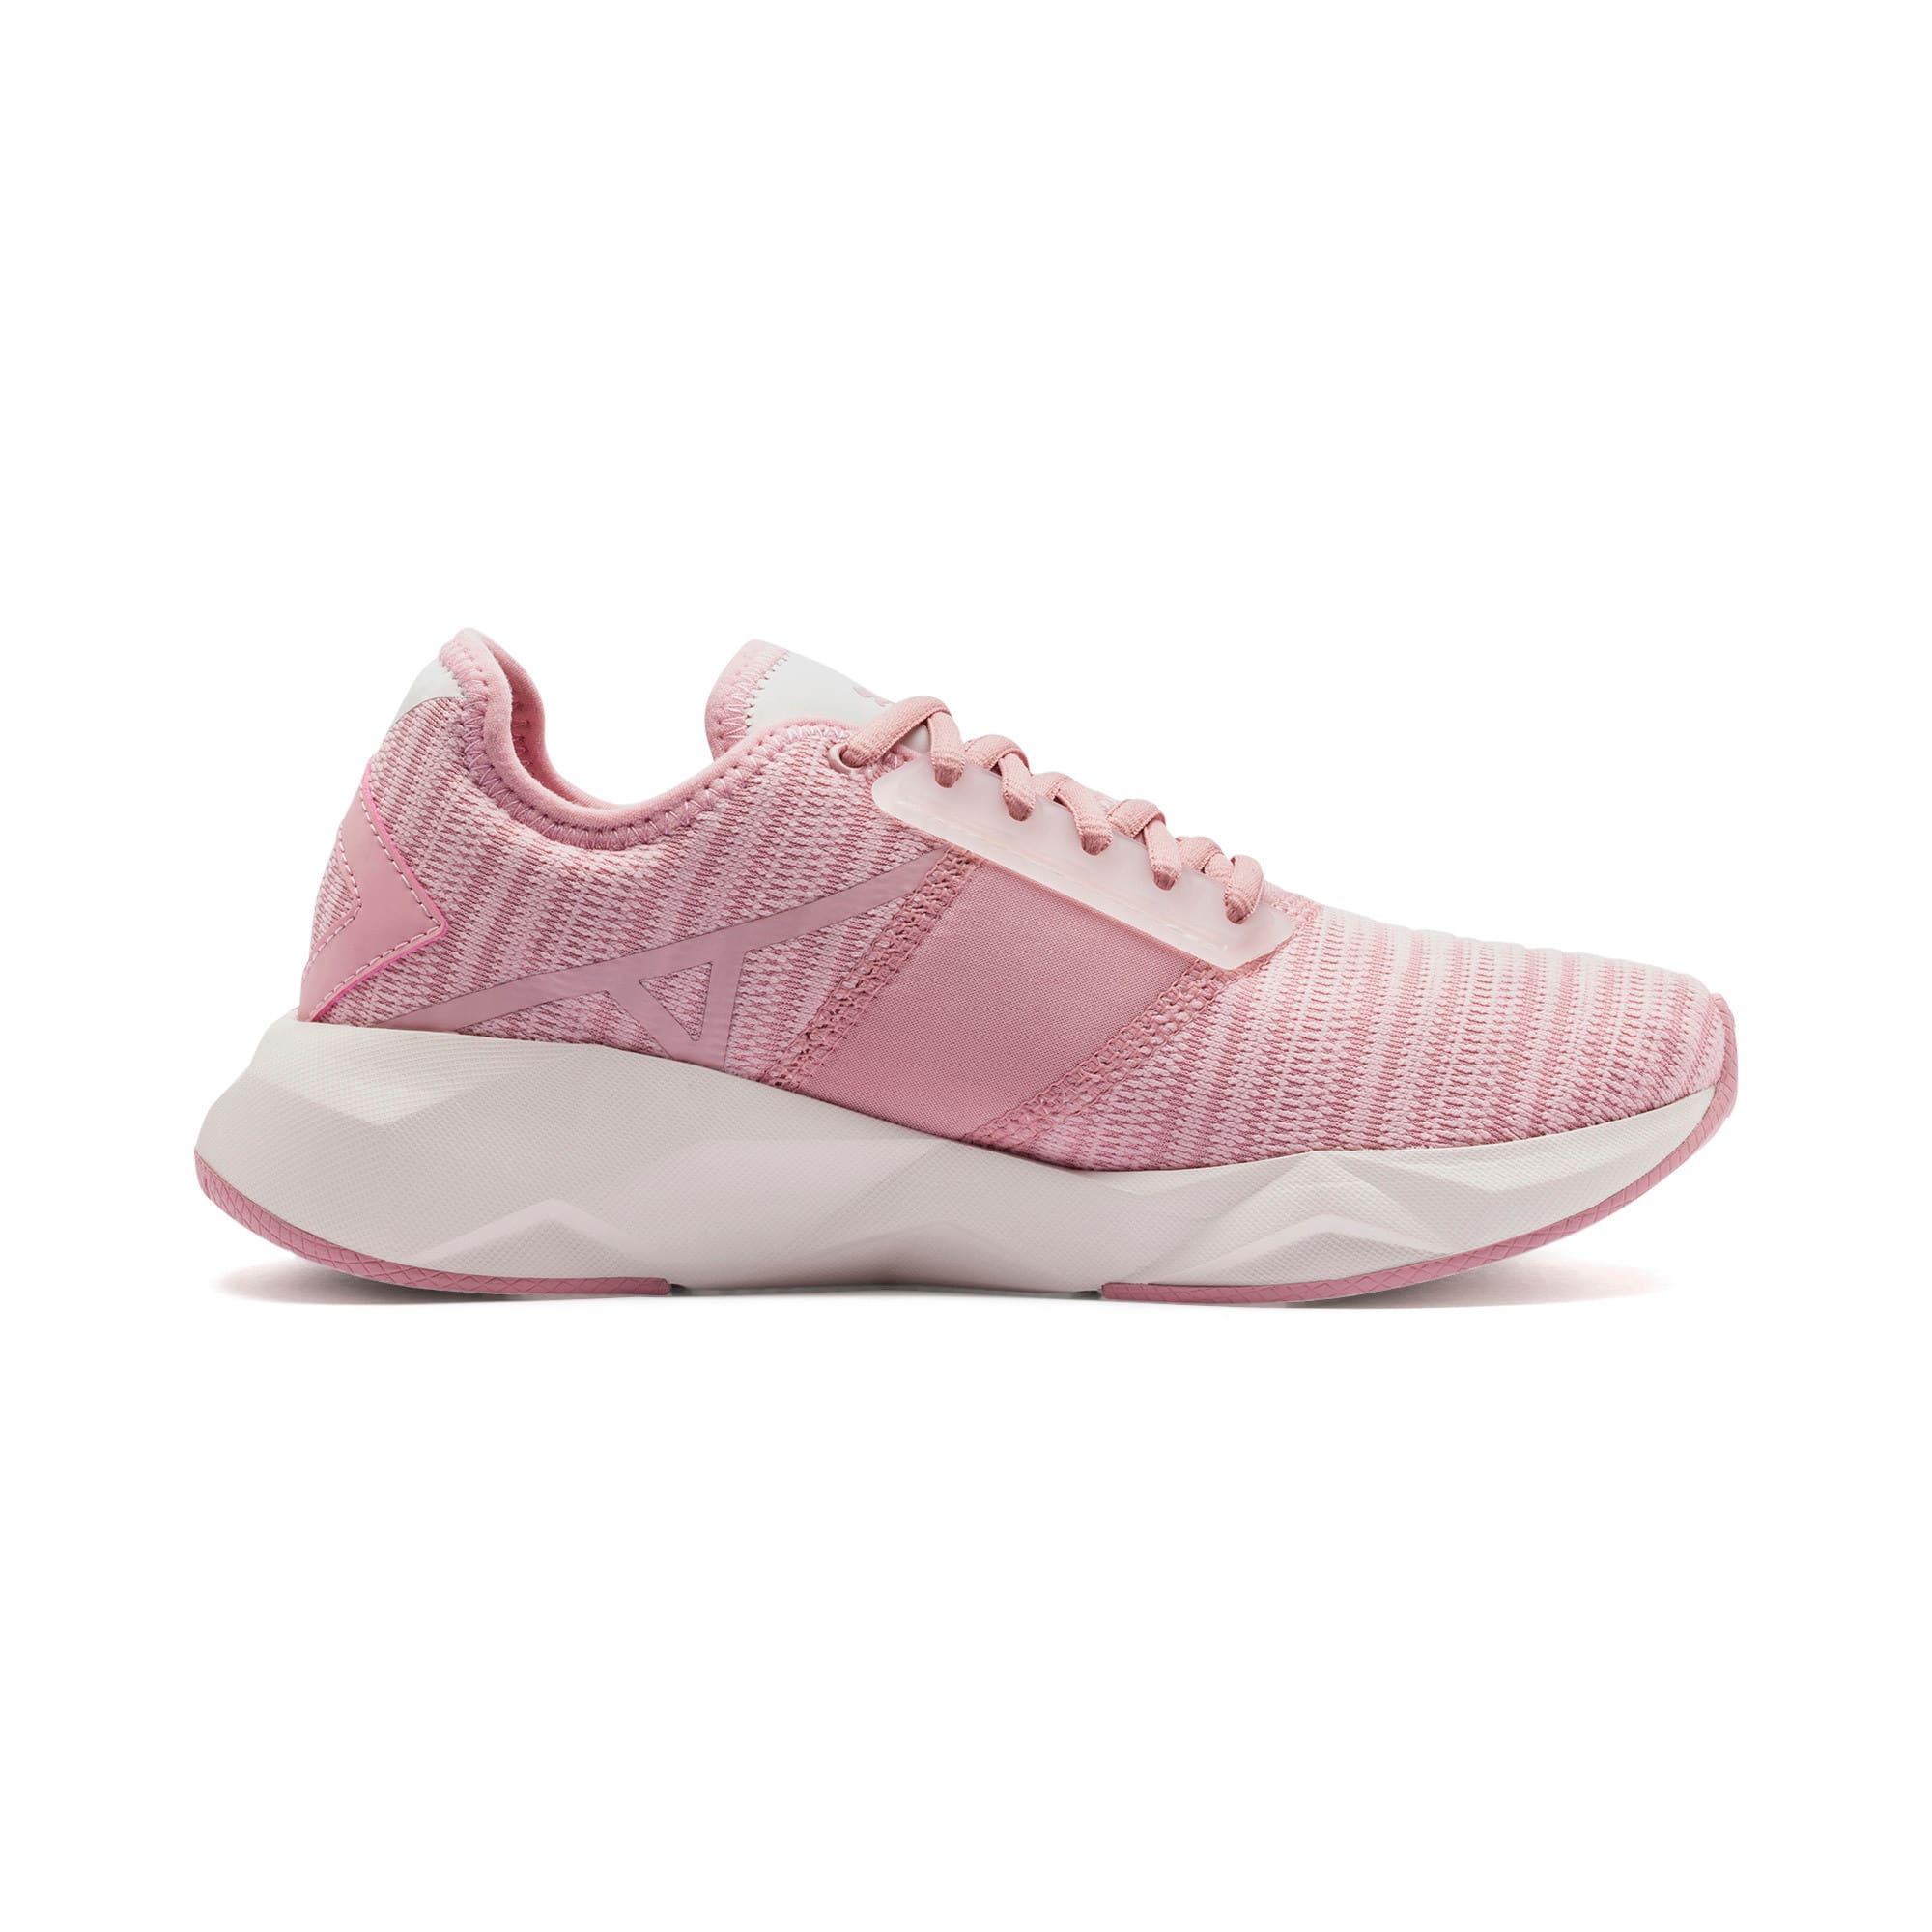 Thumbnail 6 of CELL Plasmic Women's Training Shoes, Bridal Rose-Pastel Parchment, medium